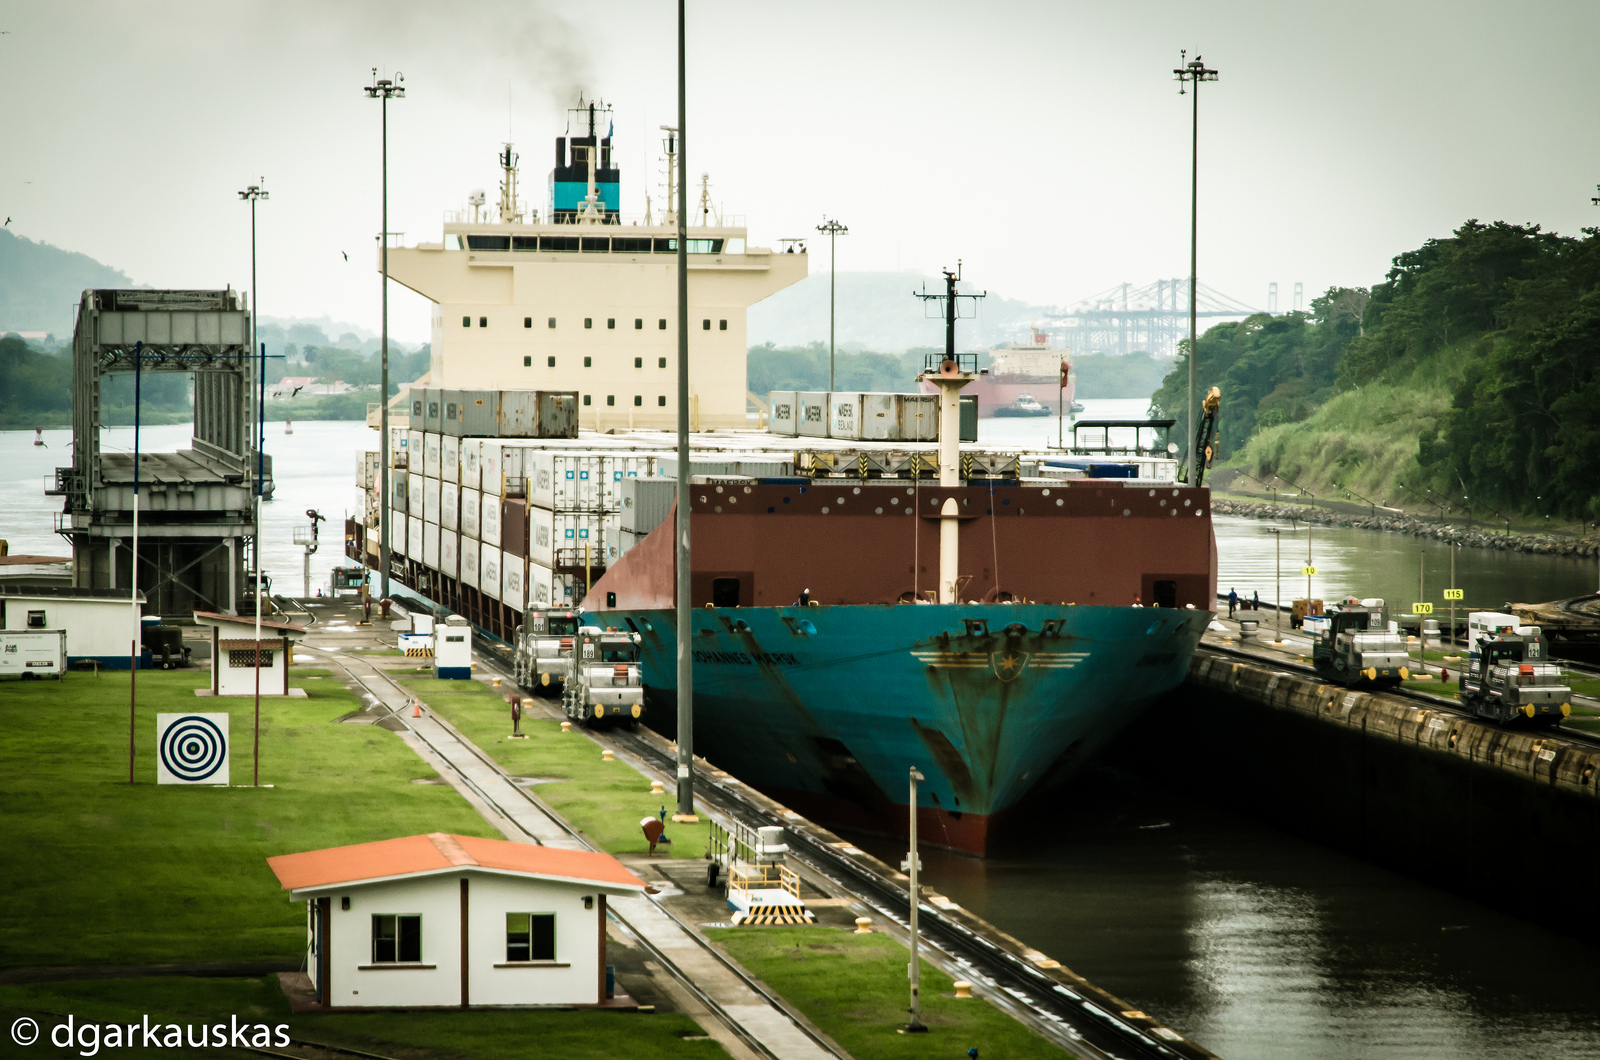 CANAL DO PANAMÁ por dgarkauskas